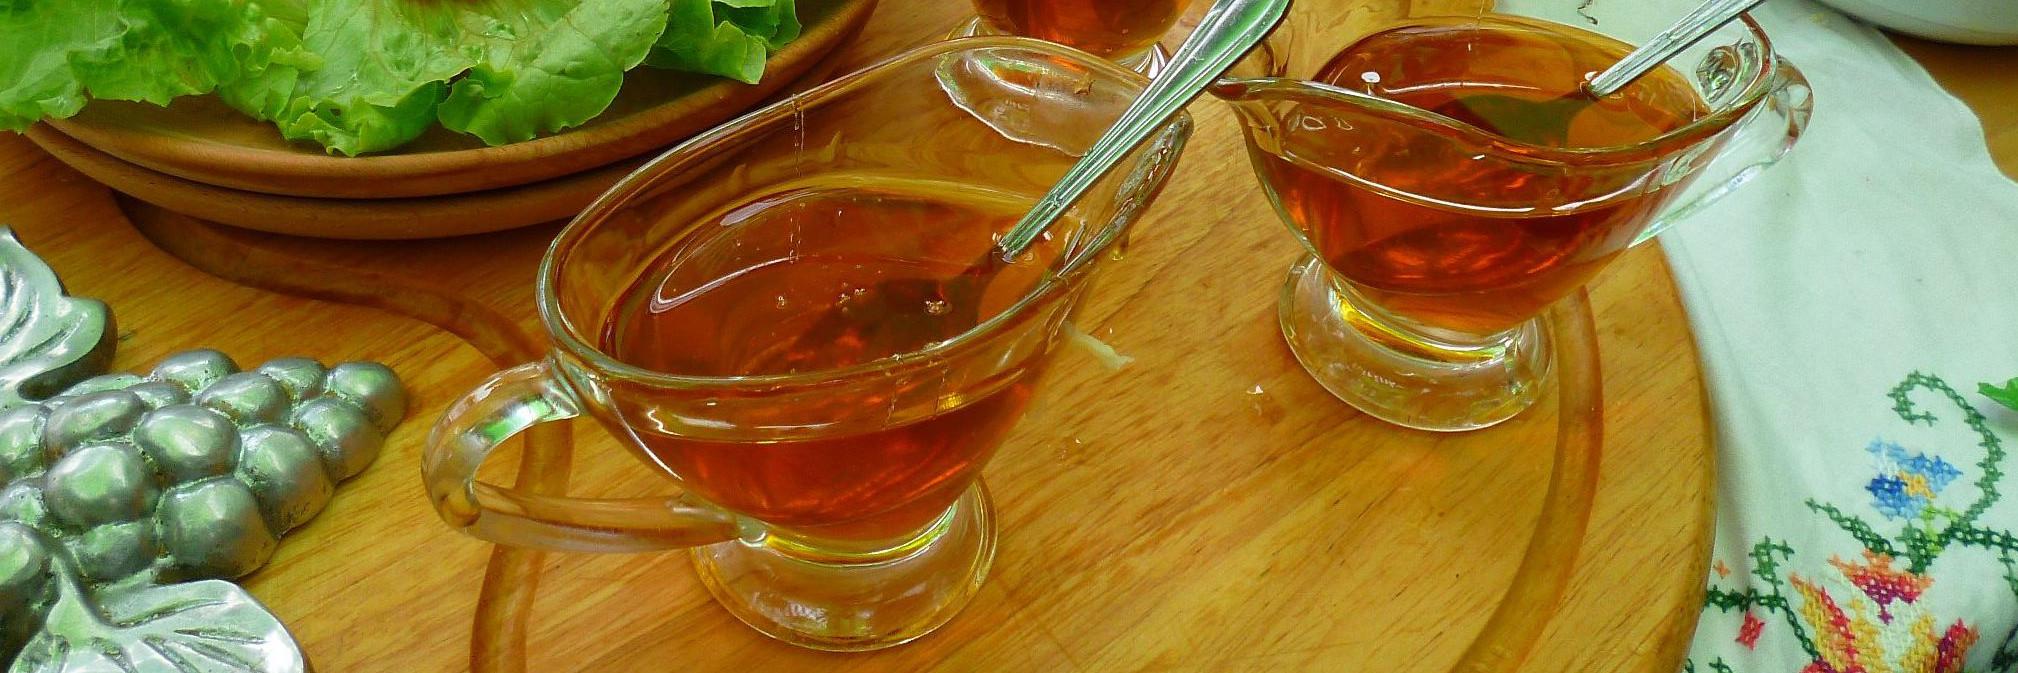 Мёд из Билечи